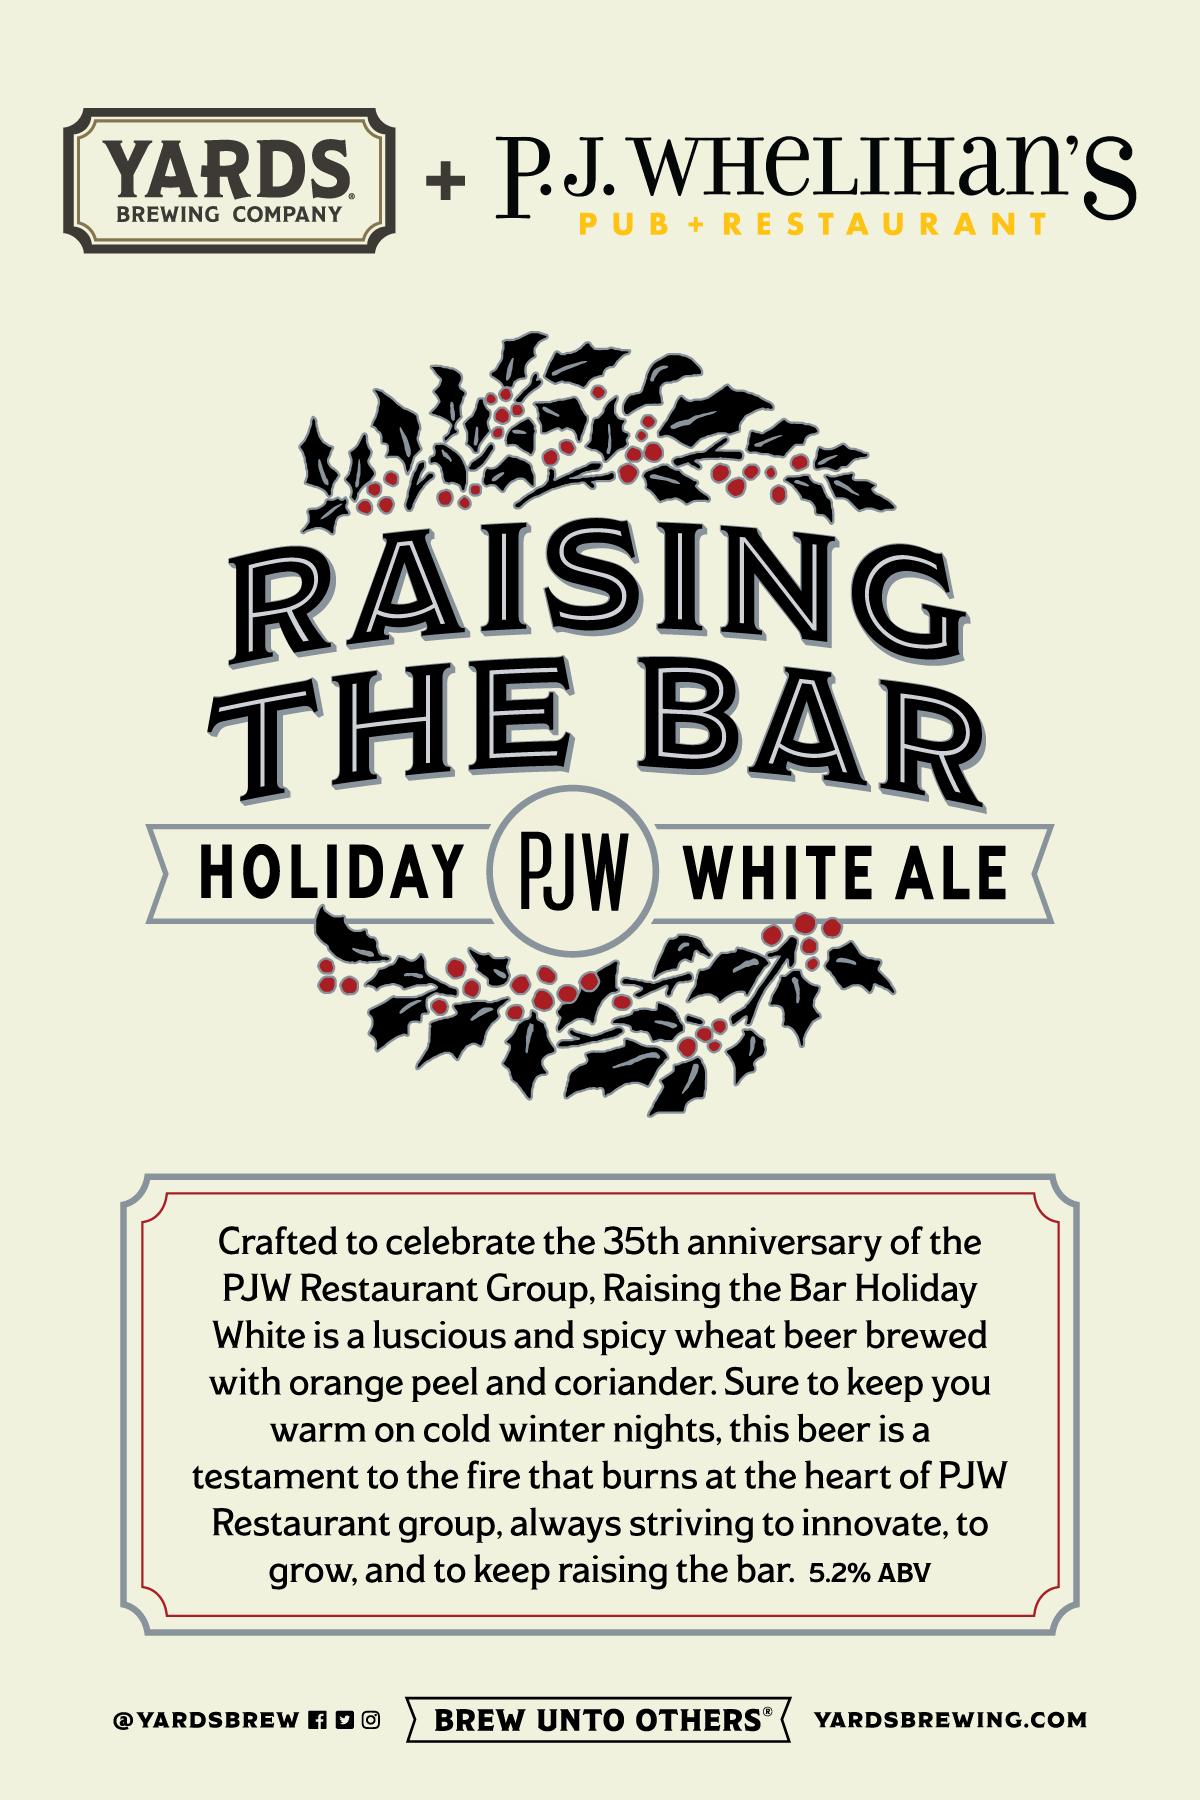 PJ-whelihans_yards-raising-the-bar-holiday-white-posters_11-06-18